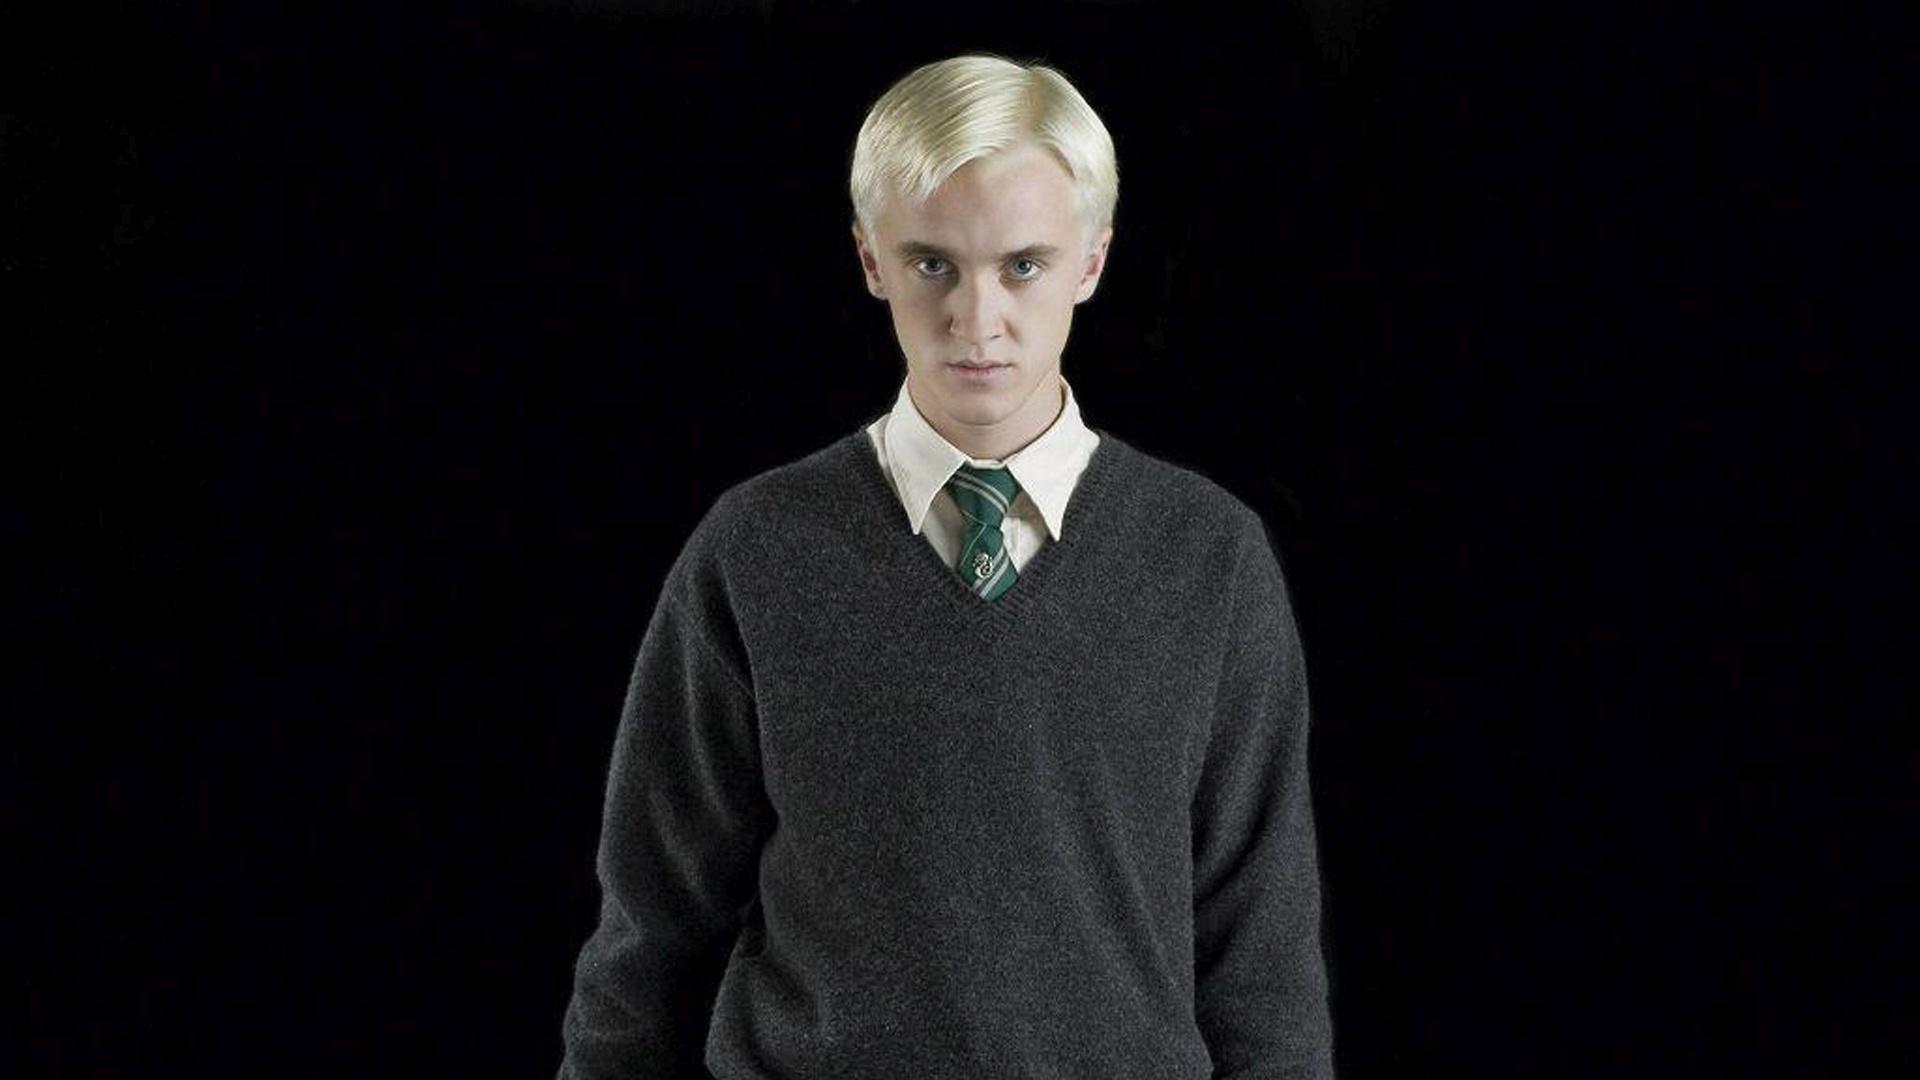 Draco Malfoy windows wallpaper